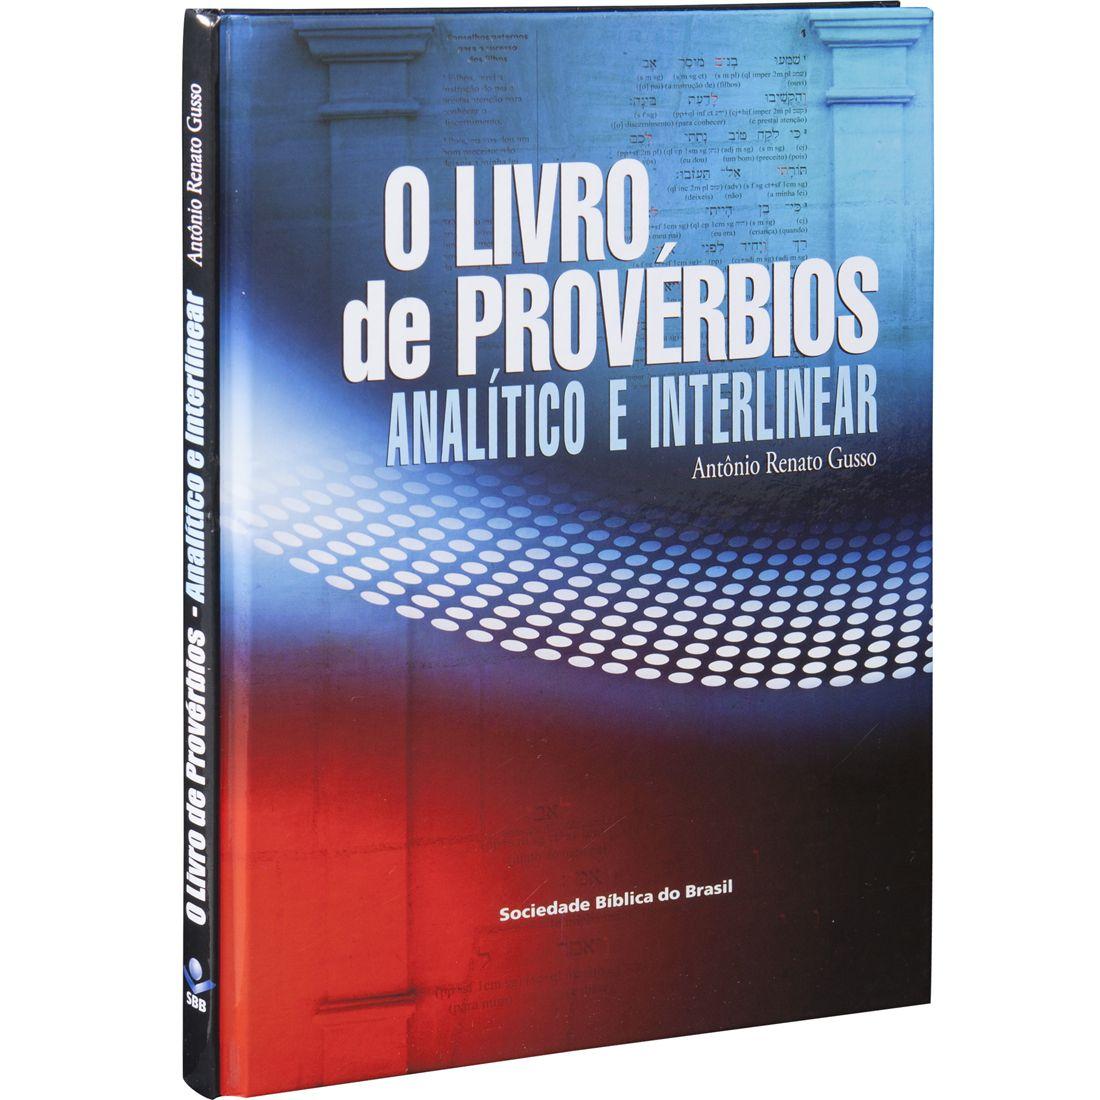 O Livro de Provérbios Analítico e Interlinear